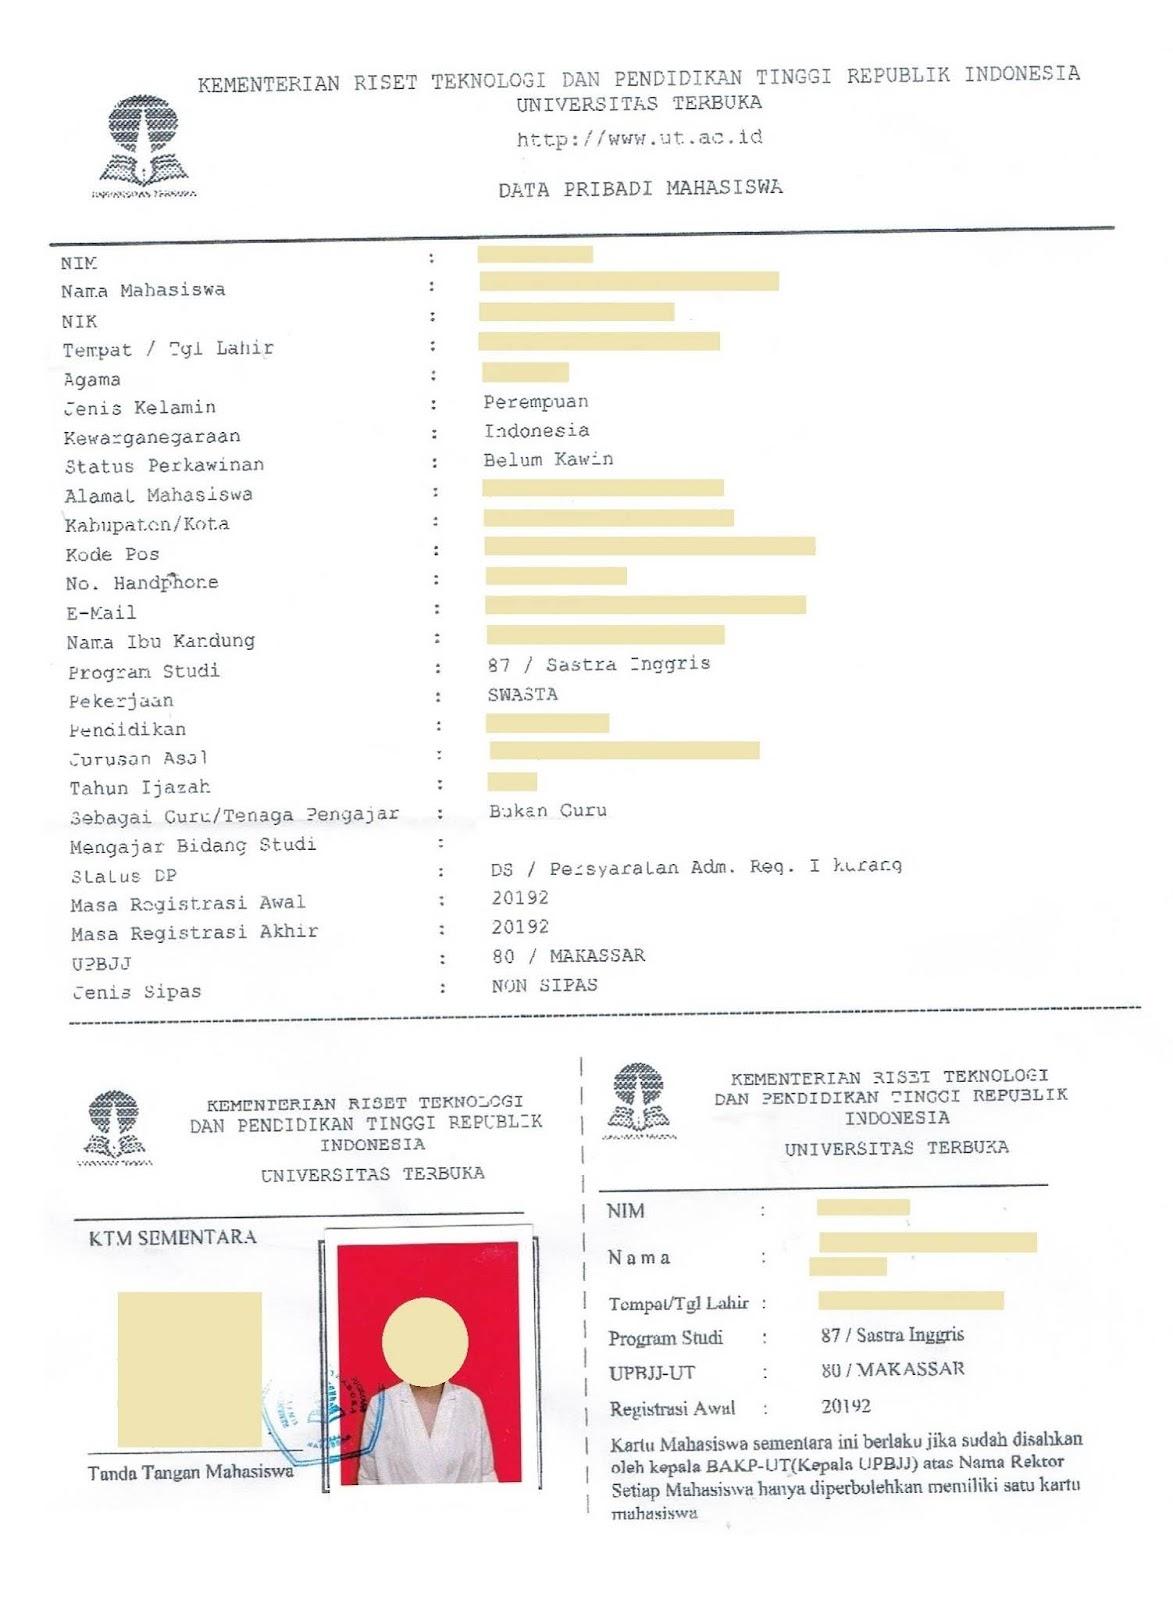 Proses Pendaftaran Universitas Terbuka